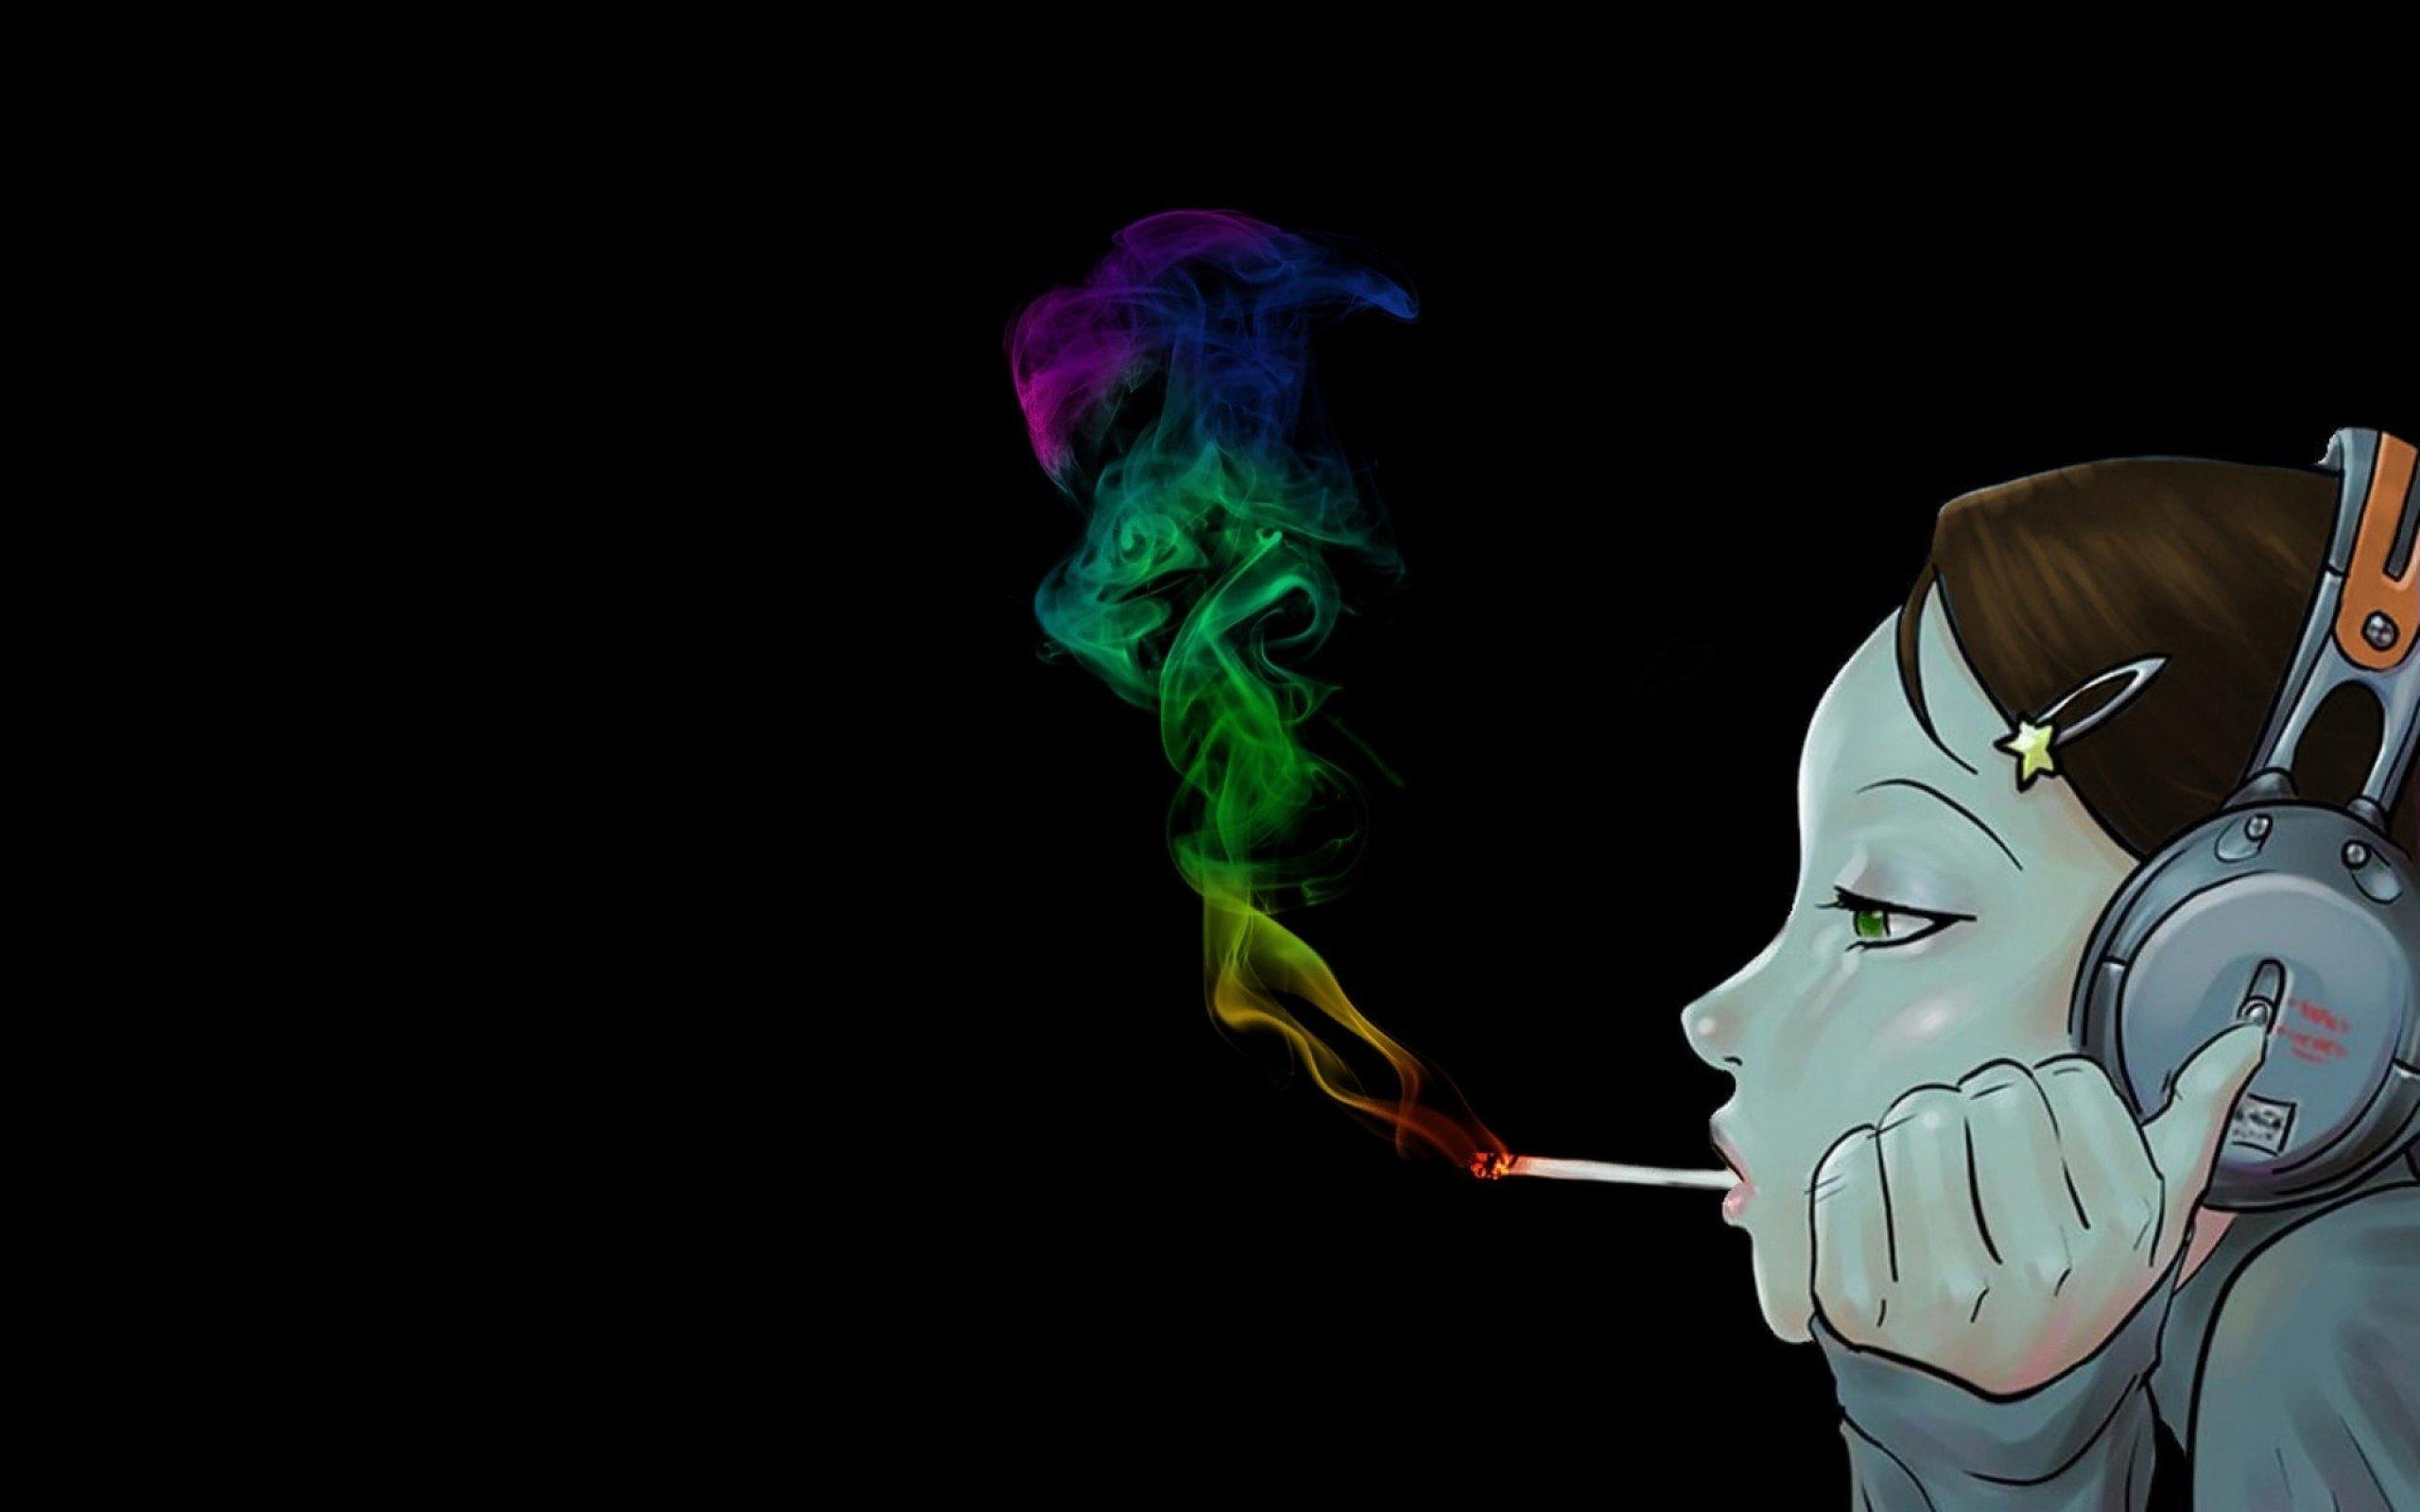 Weed Smoke Wallpaper High Definition - Fondos De Pantalla Tumblr Pc , HD Wallpaper & Backgrounds